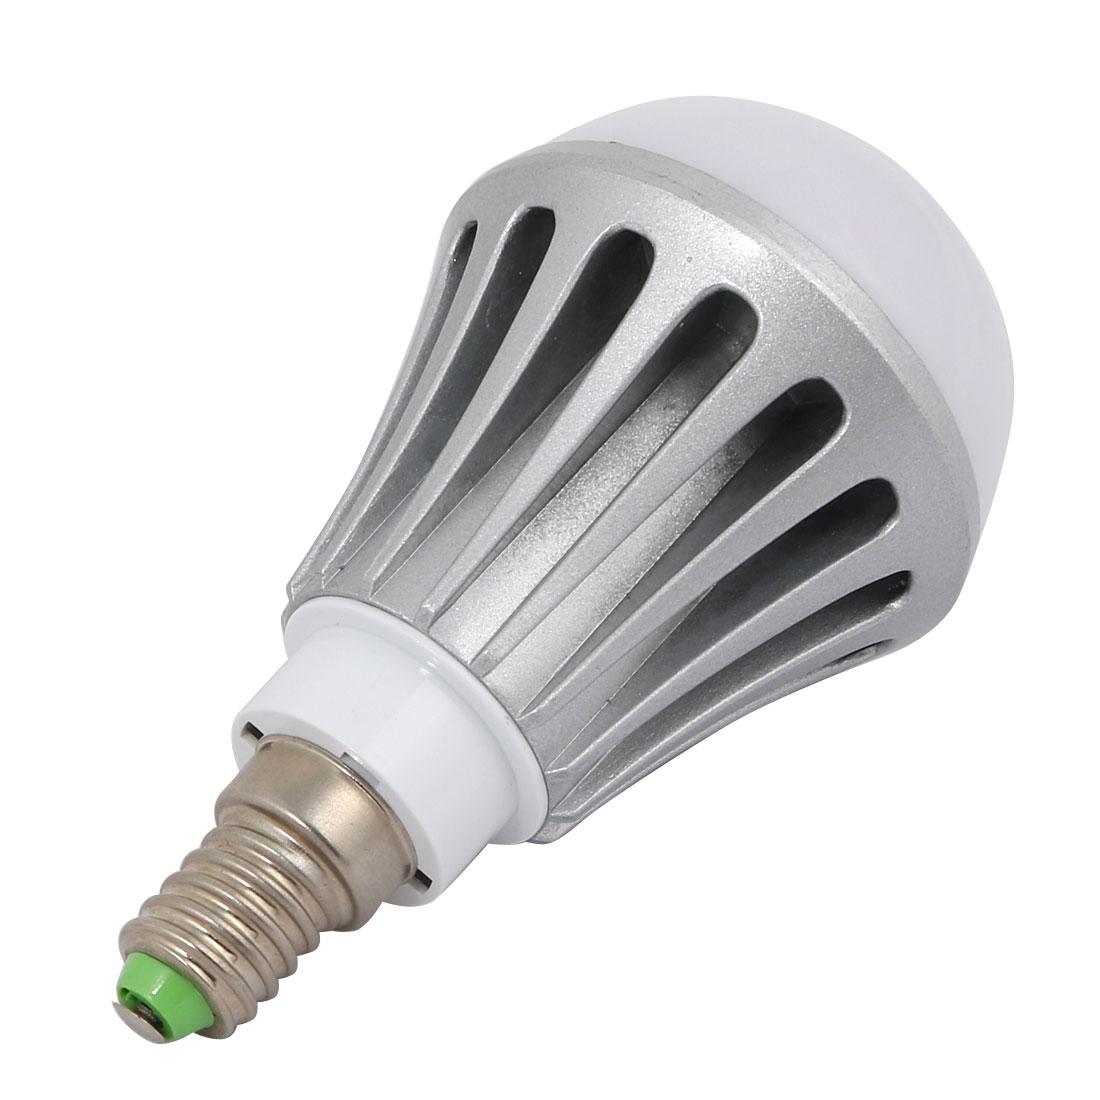 2Pcs 5W/7W Sliver Tone Aluminum Ball - Bulb Lamp Housing E14 Base w White Cover - image 2 of 4